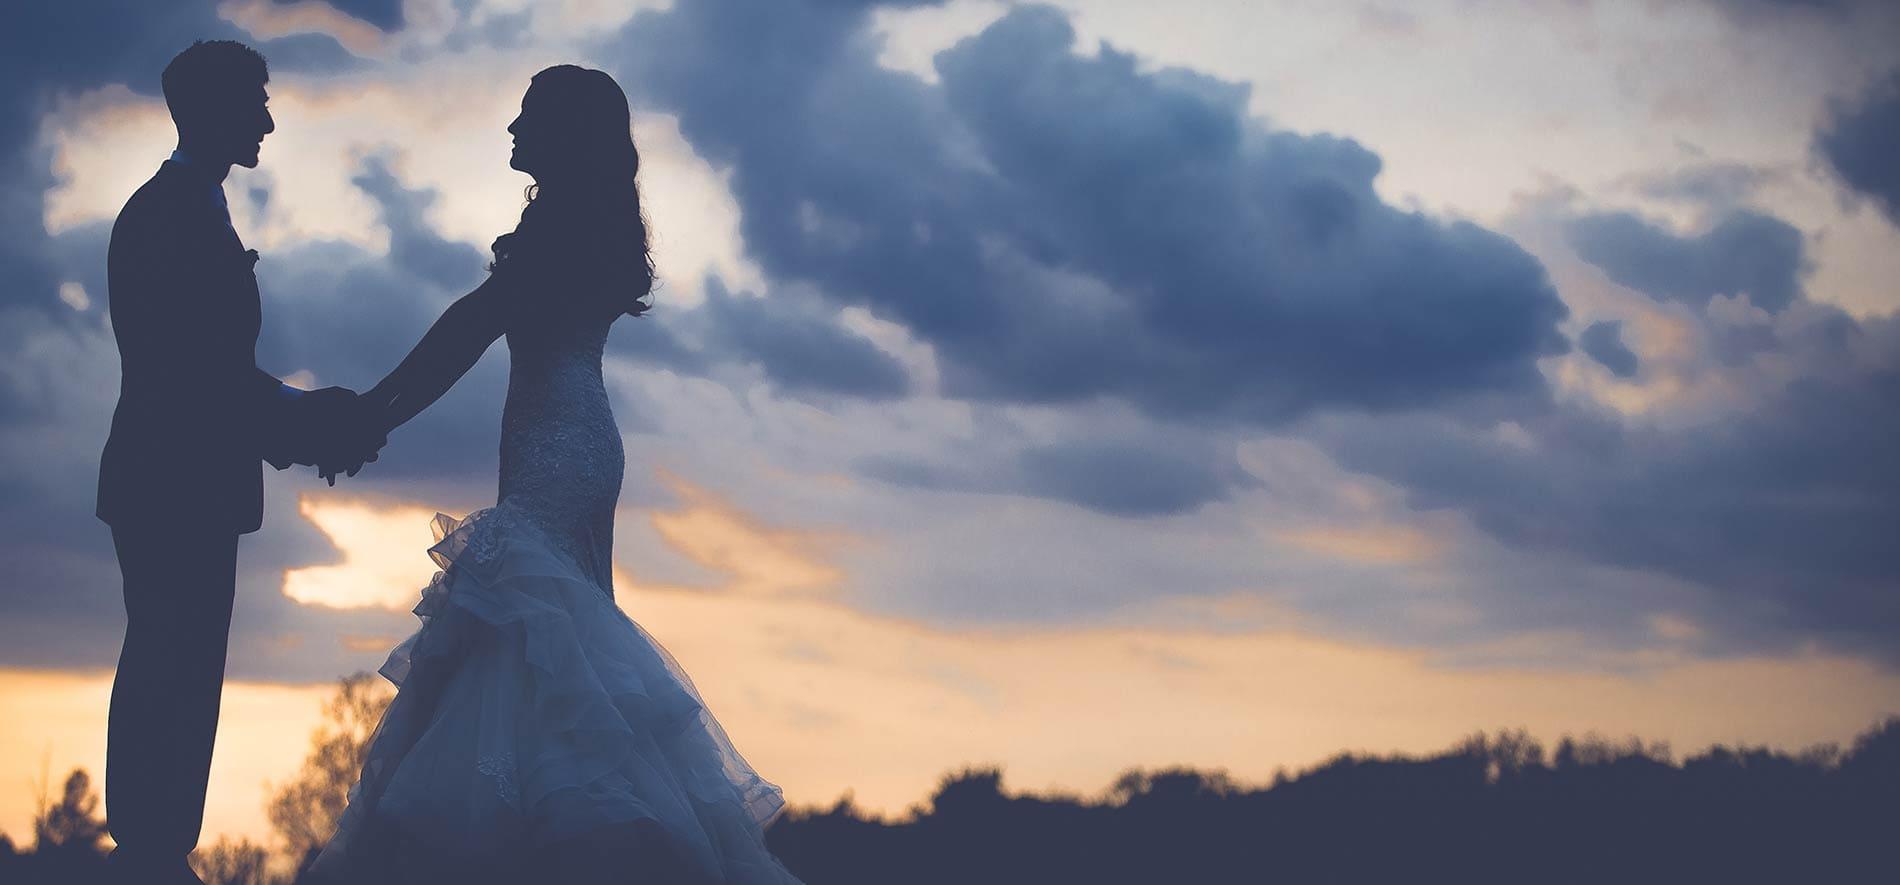 Логотип свадебного салона. Разработка логотипа салона свадебной моды.